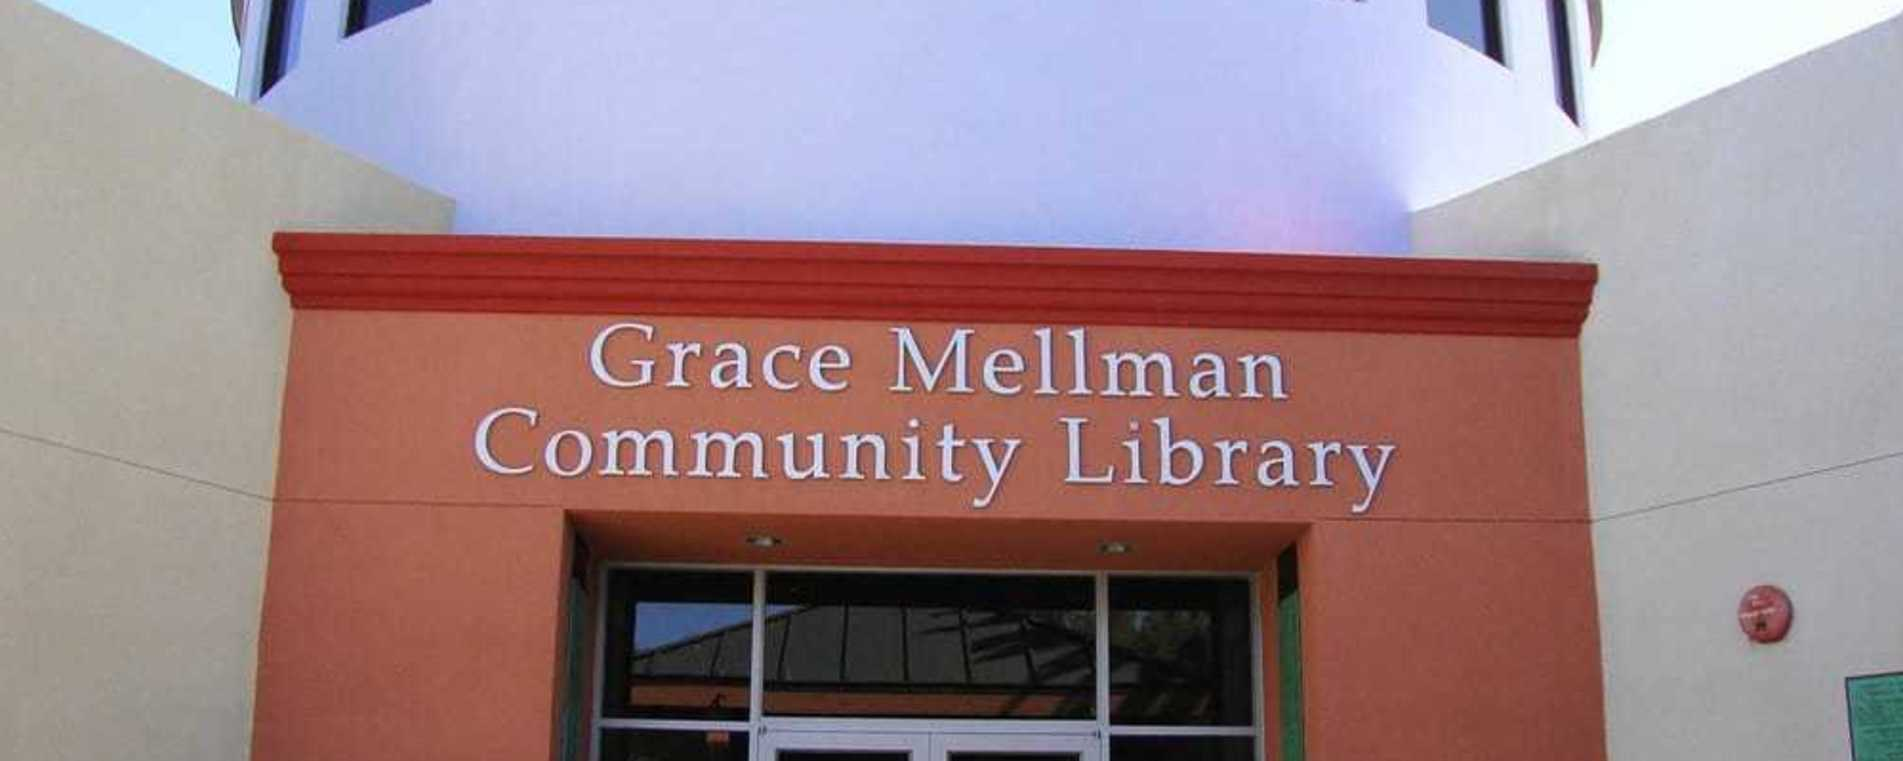 Grace Mellman Library